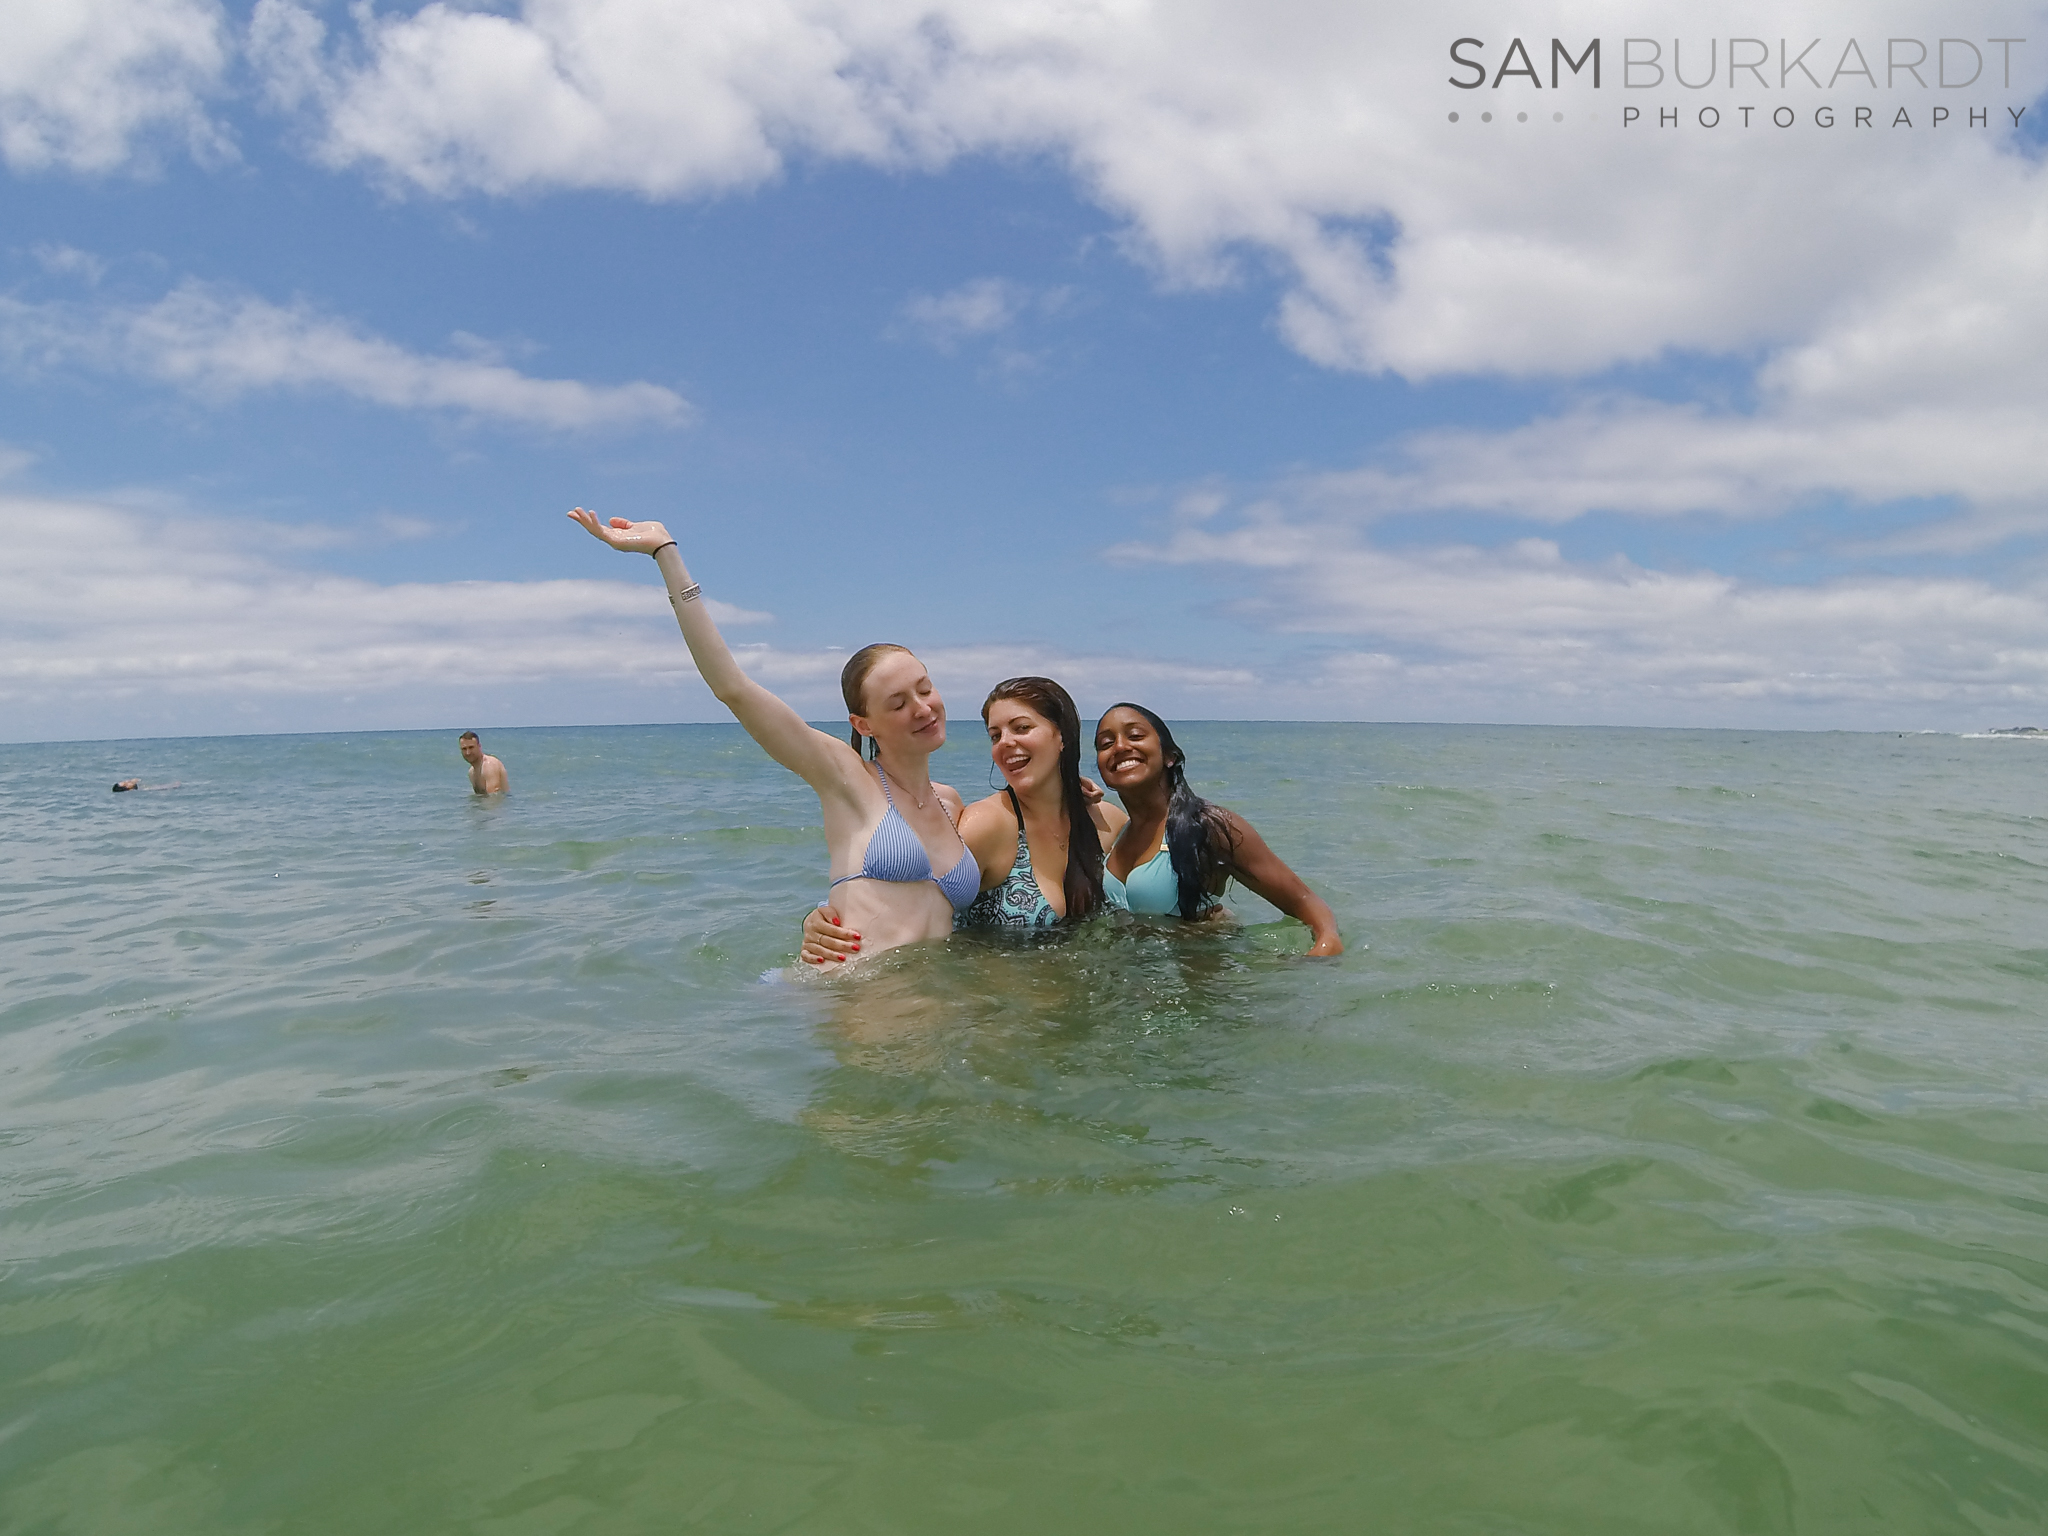 samburkardt_engagement_vacation_beach_cape_san_blas_florida_camping_gopro_0026.jpg